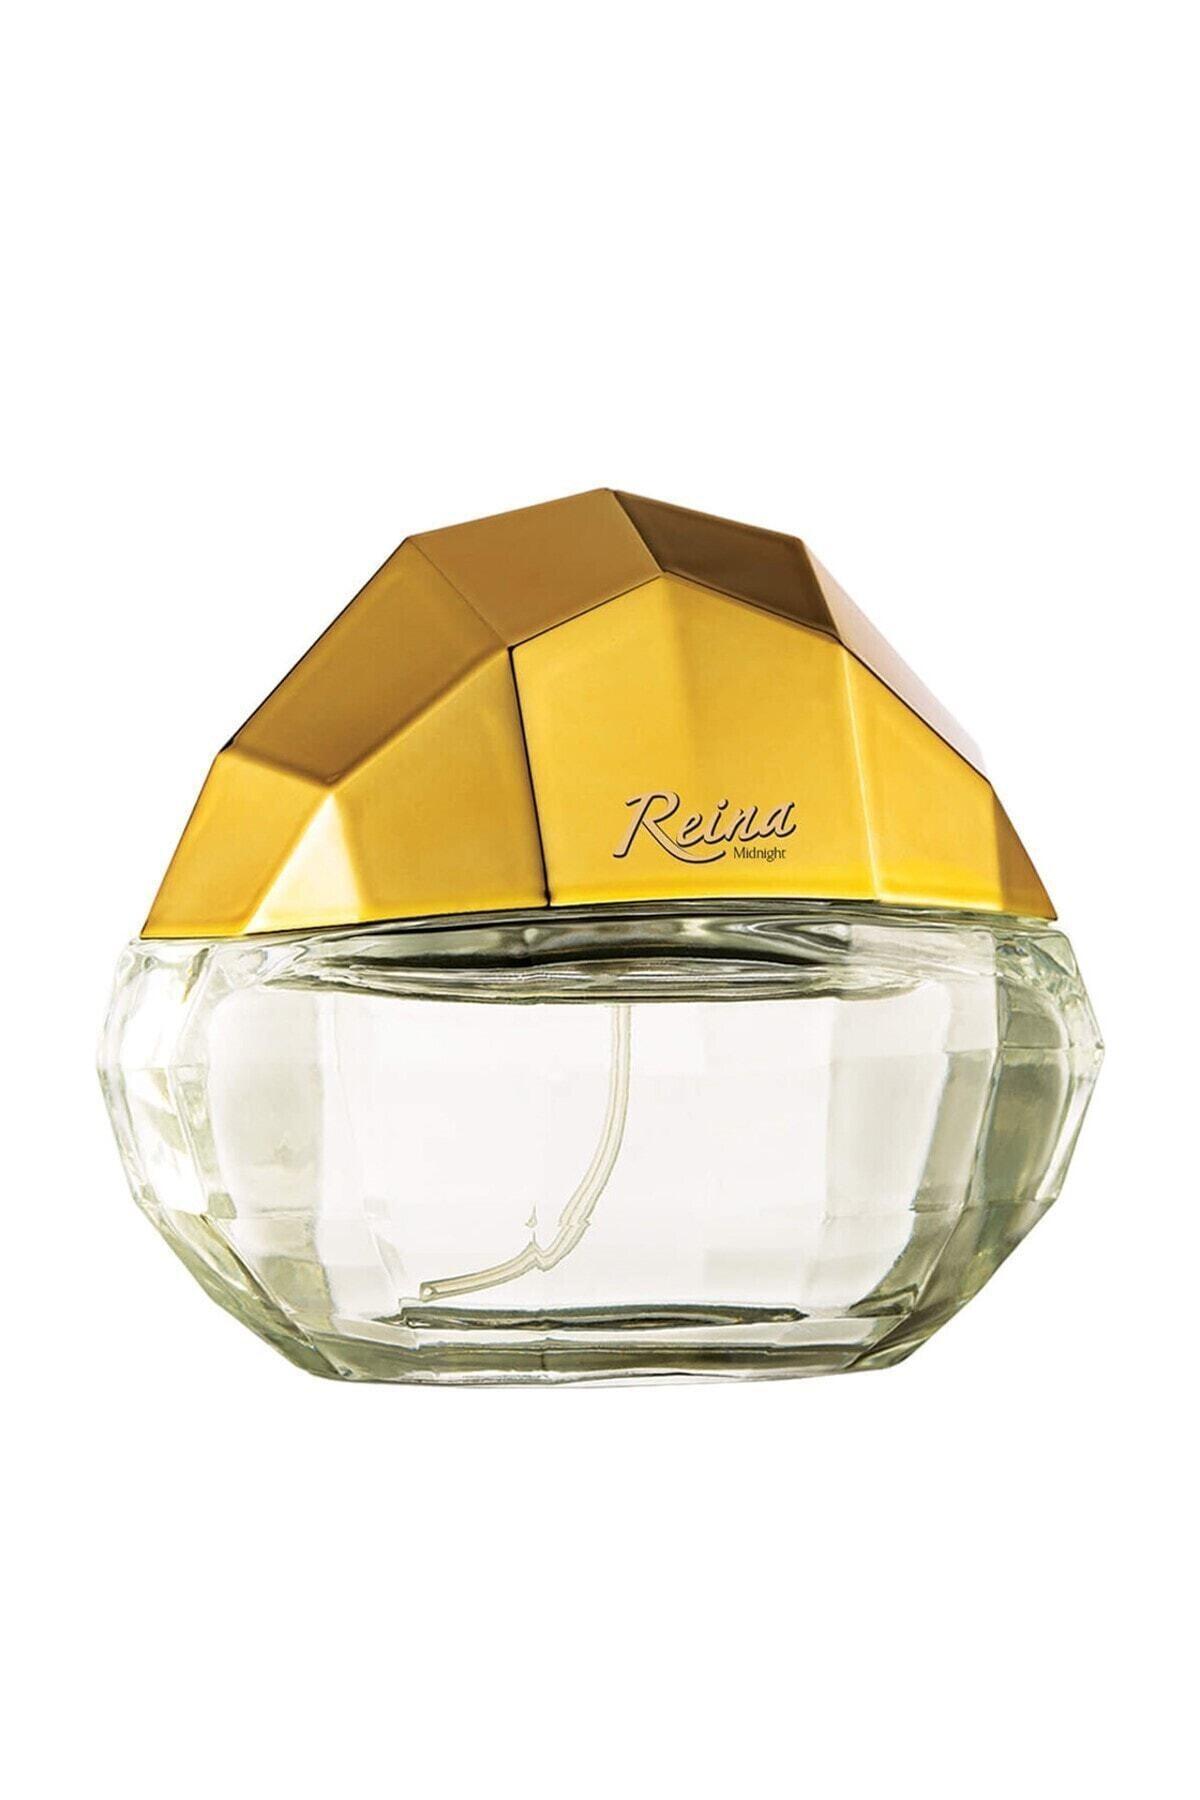 reina beauty Reina Kadın Parfümü 65 ml 1